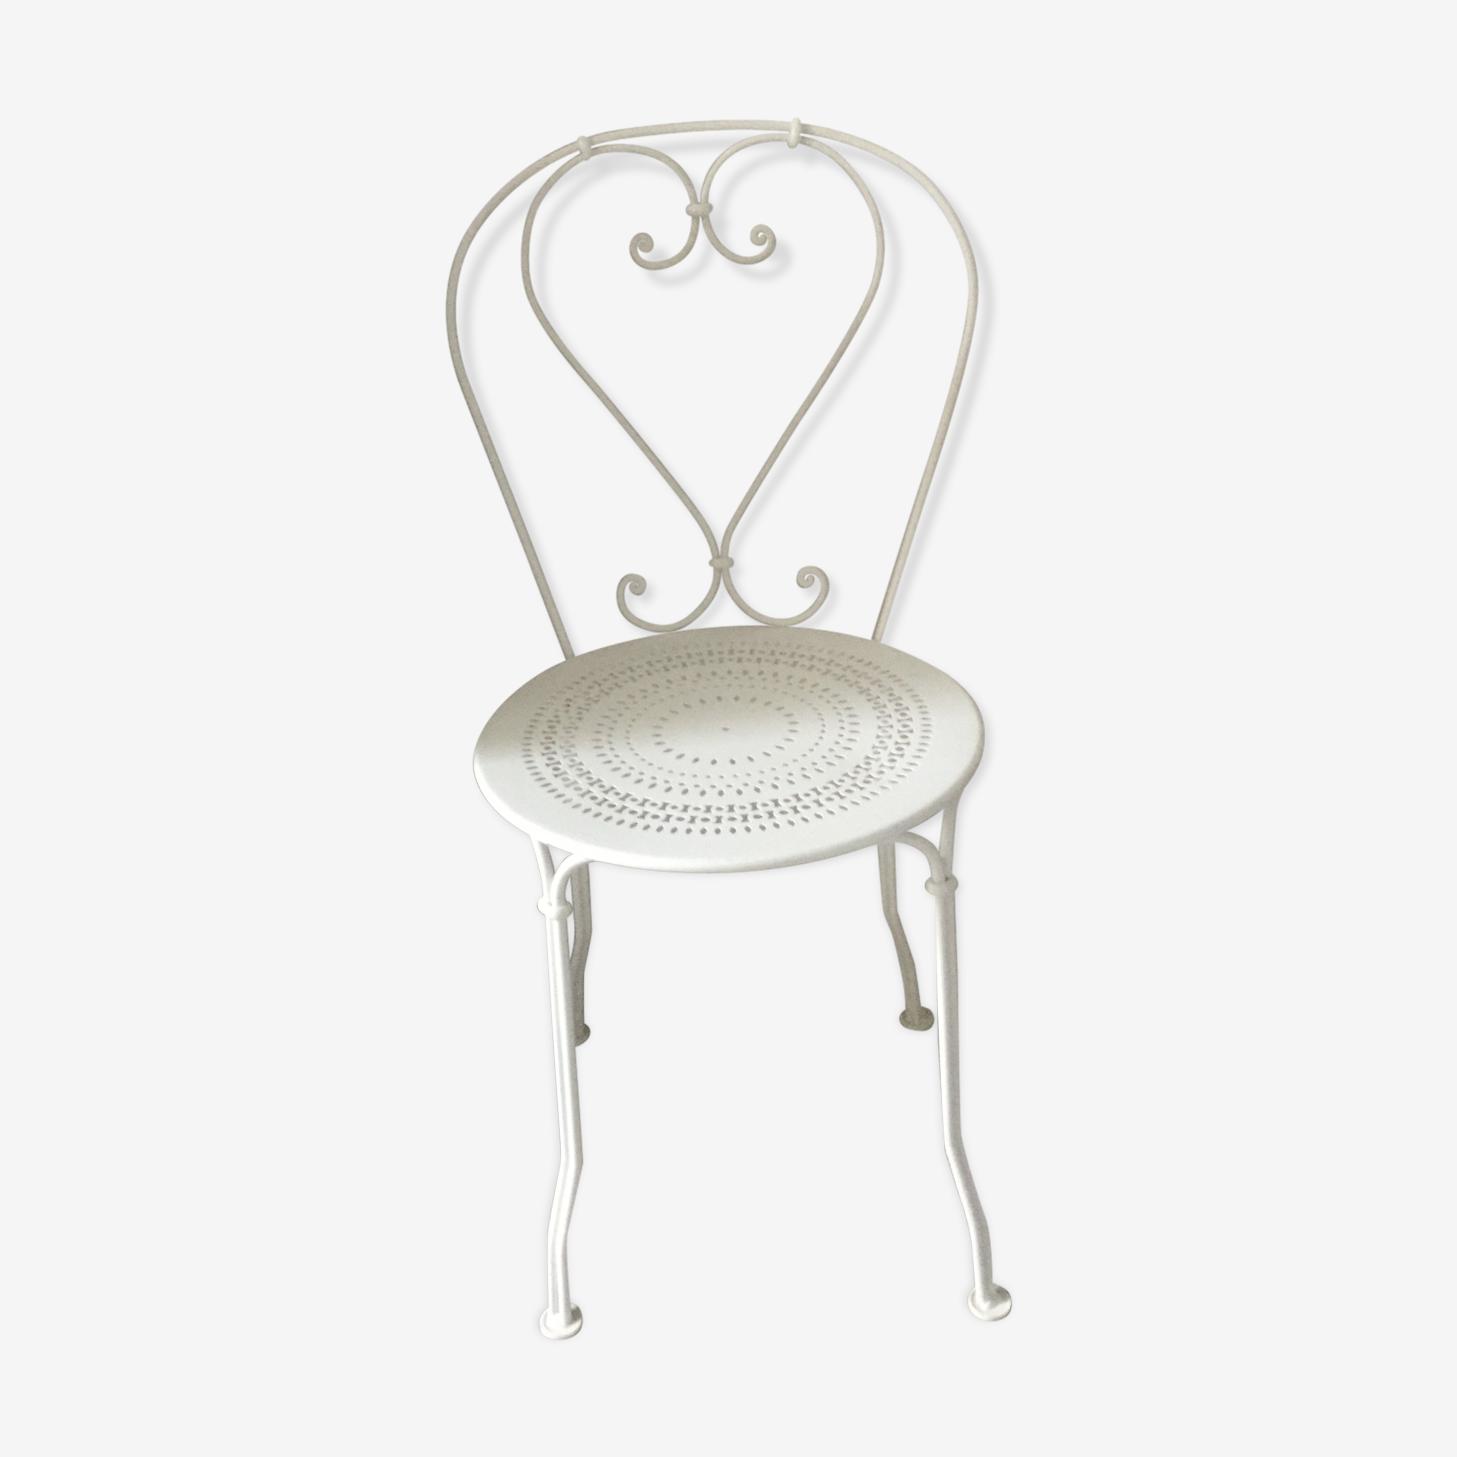 White metal chairs